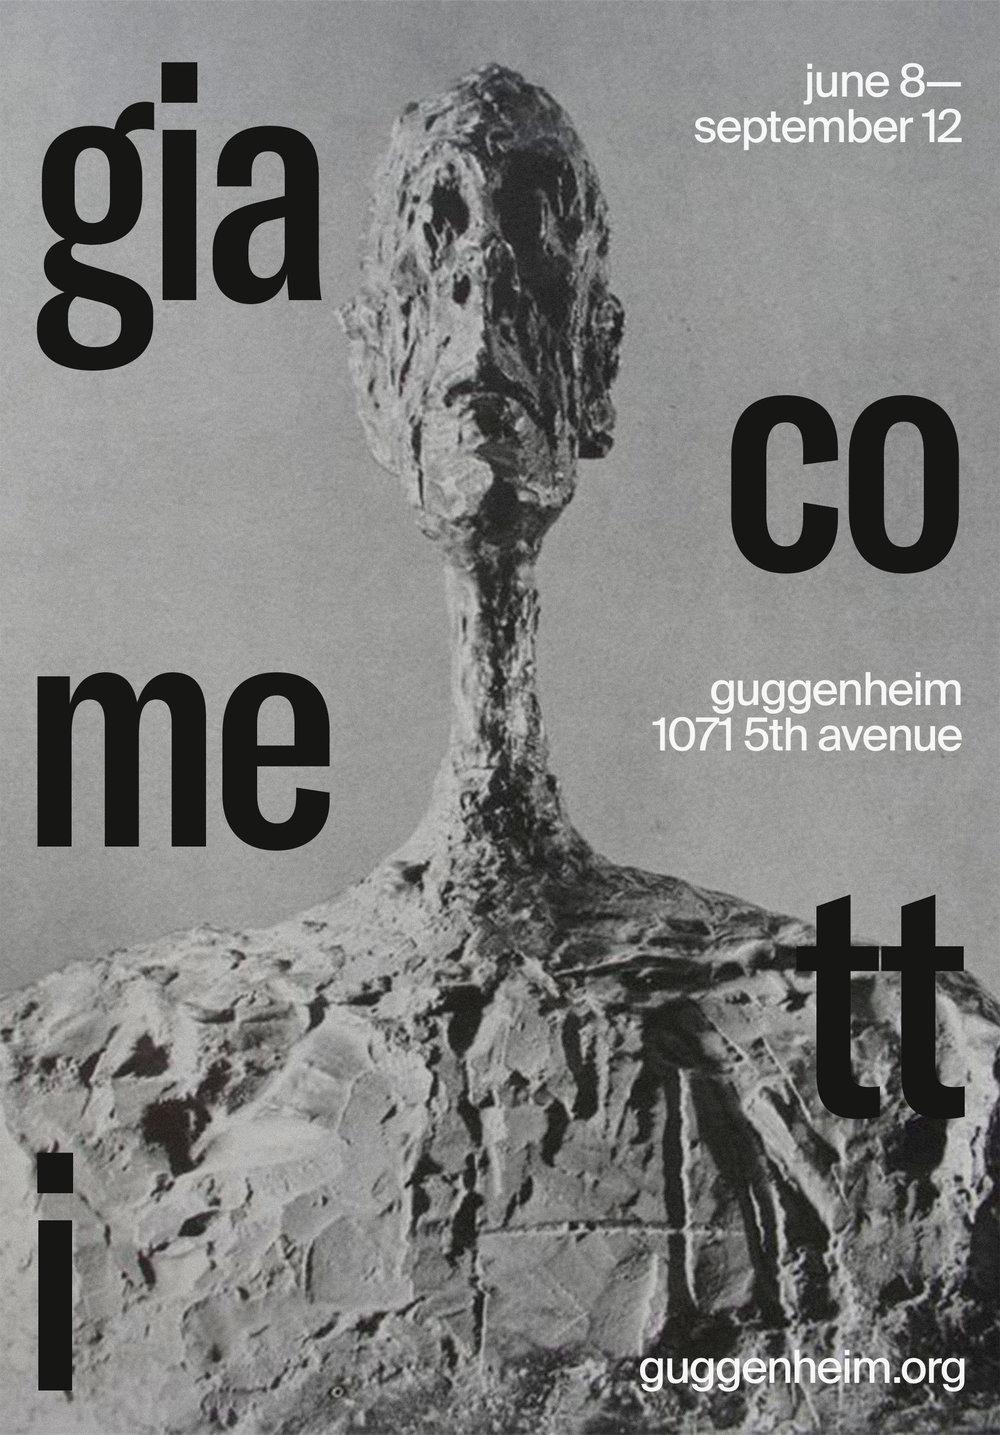 giacometti poster updated.jpg